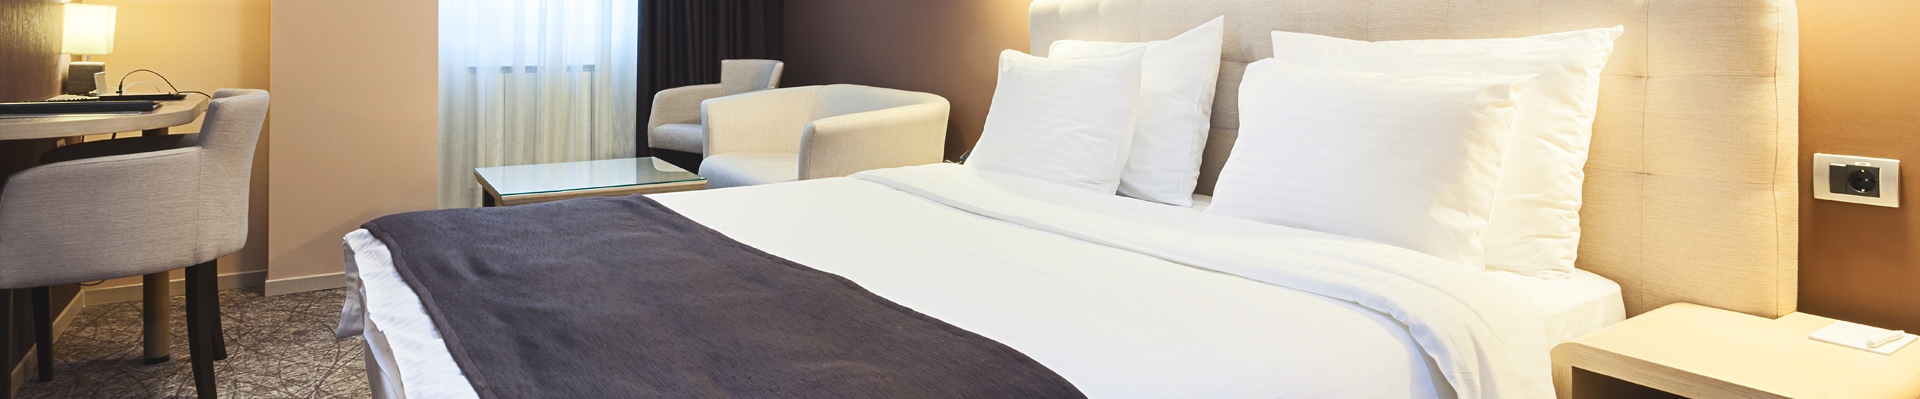 Leisure & Hospitality Maintenance